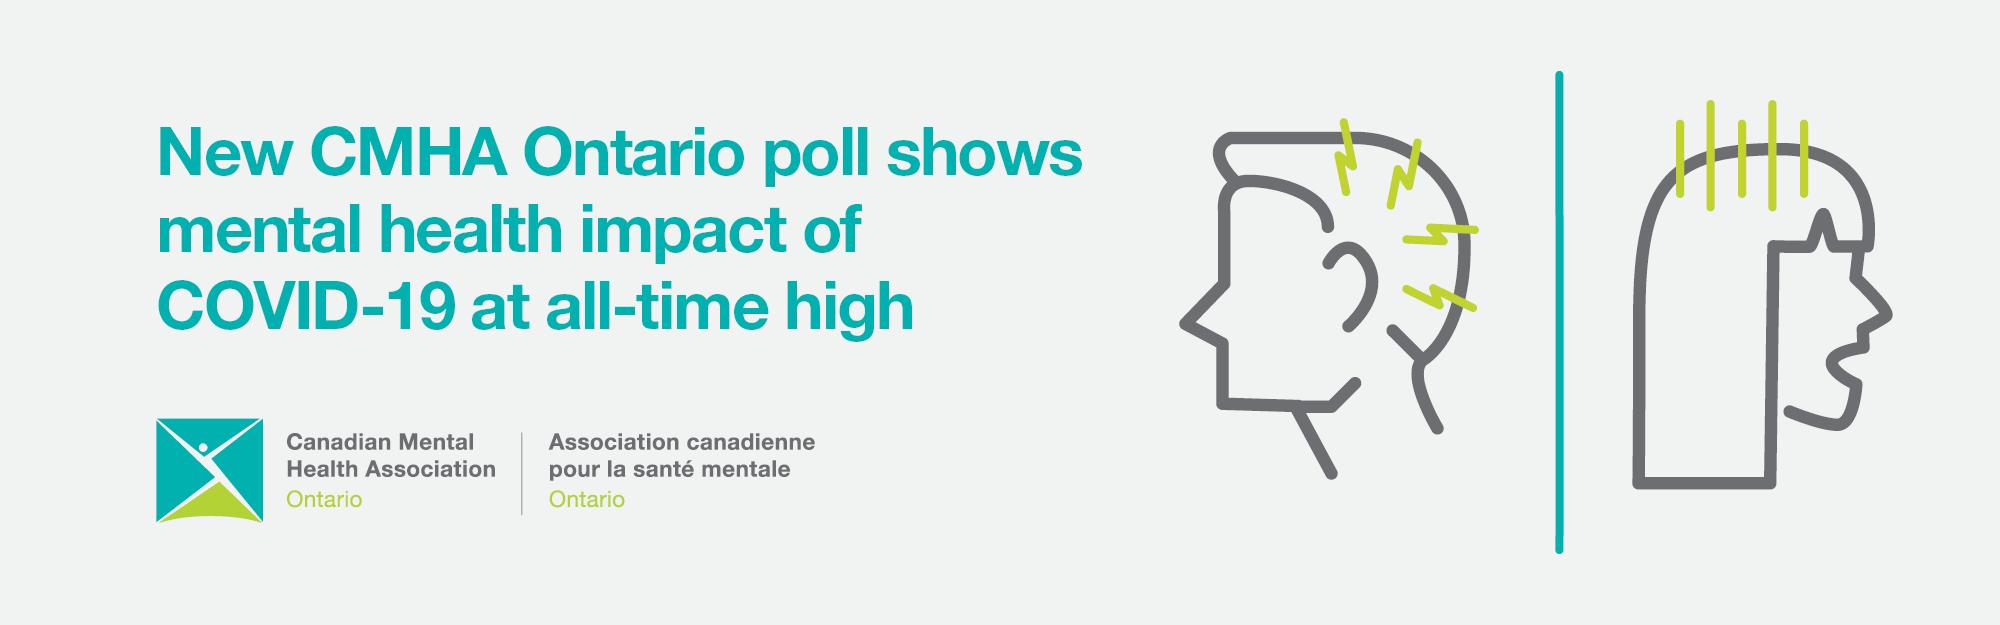 CMHA 3rd poll data